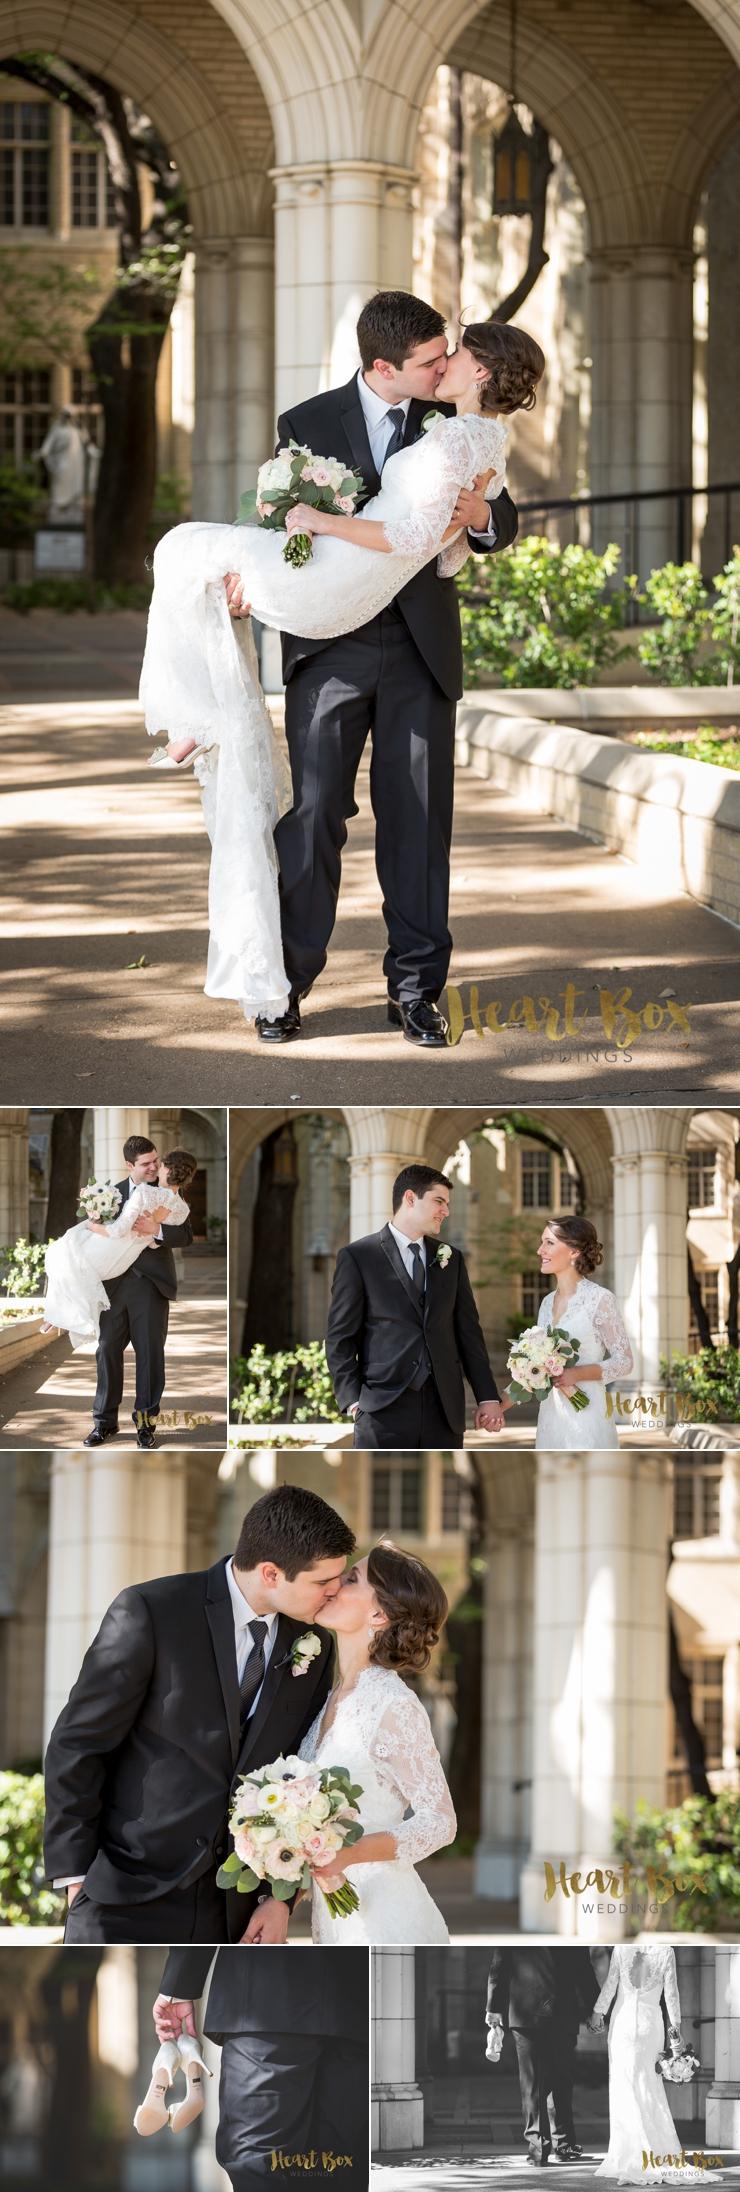 Fegan Wedding Blog Collages 9.jpg